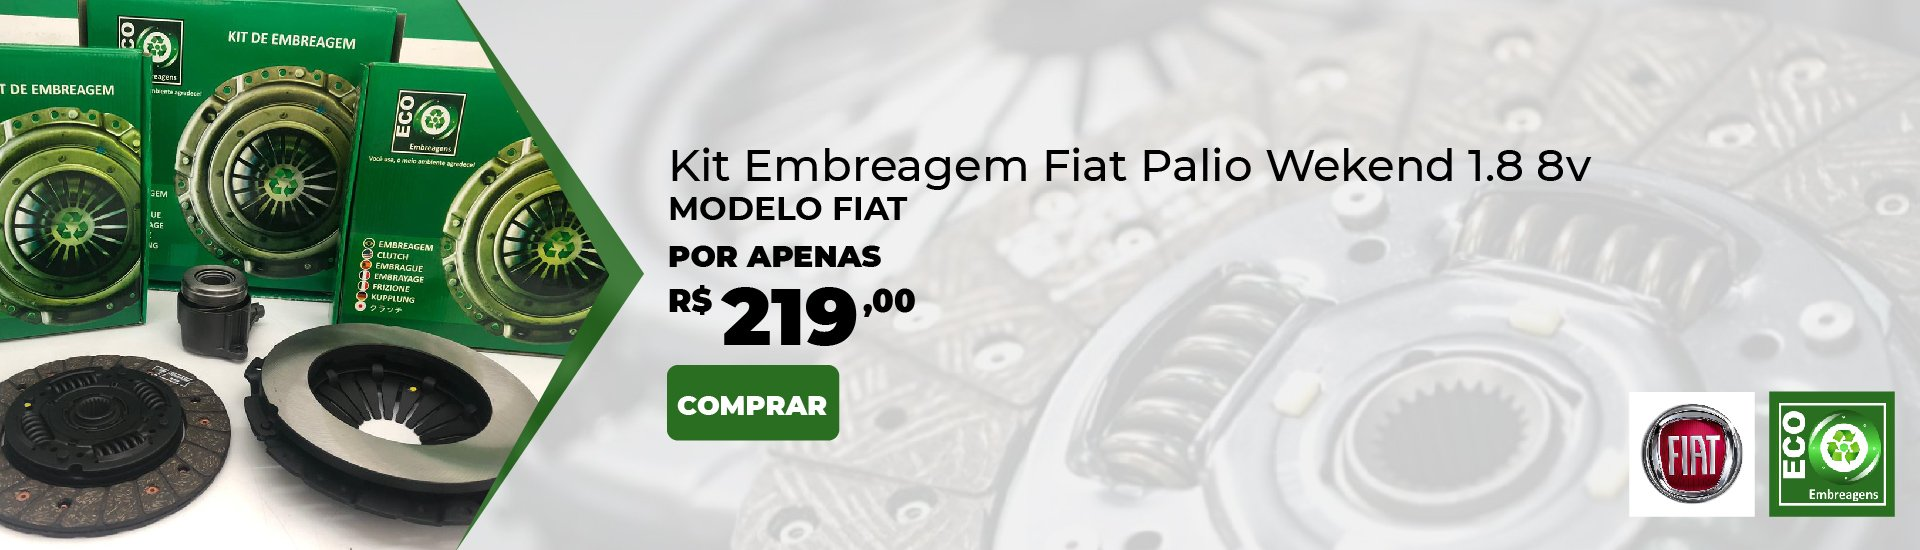 Full Fiat